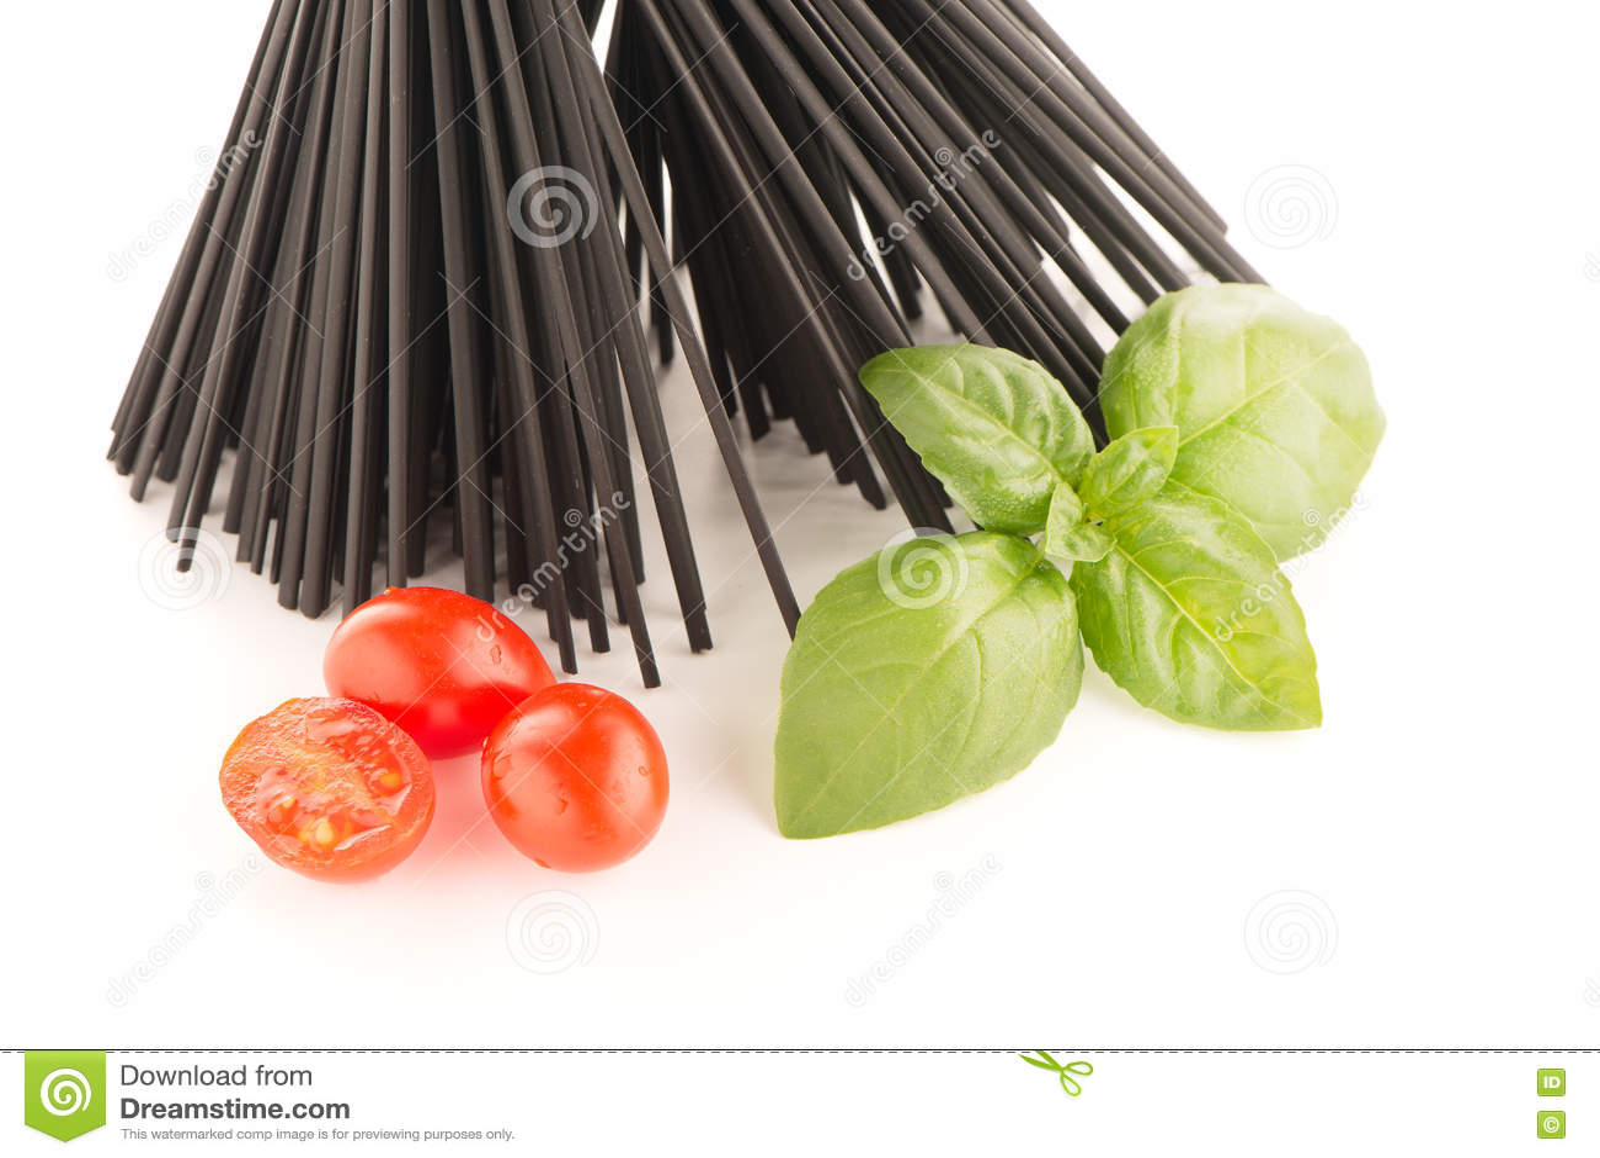 Groupe de spaghetti noirs